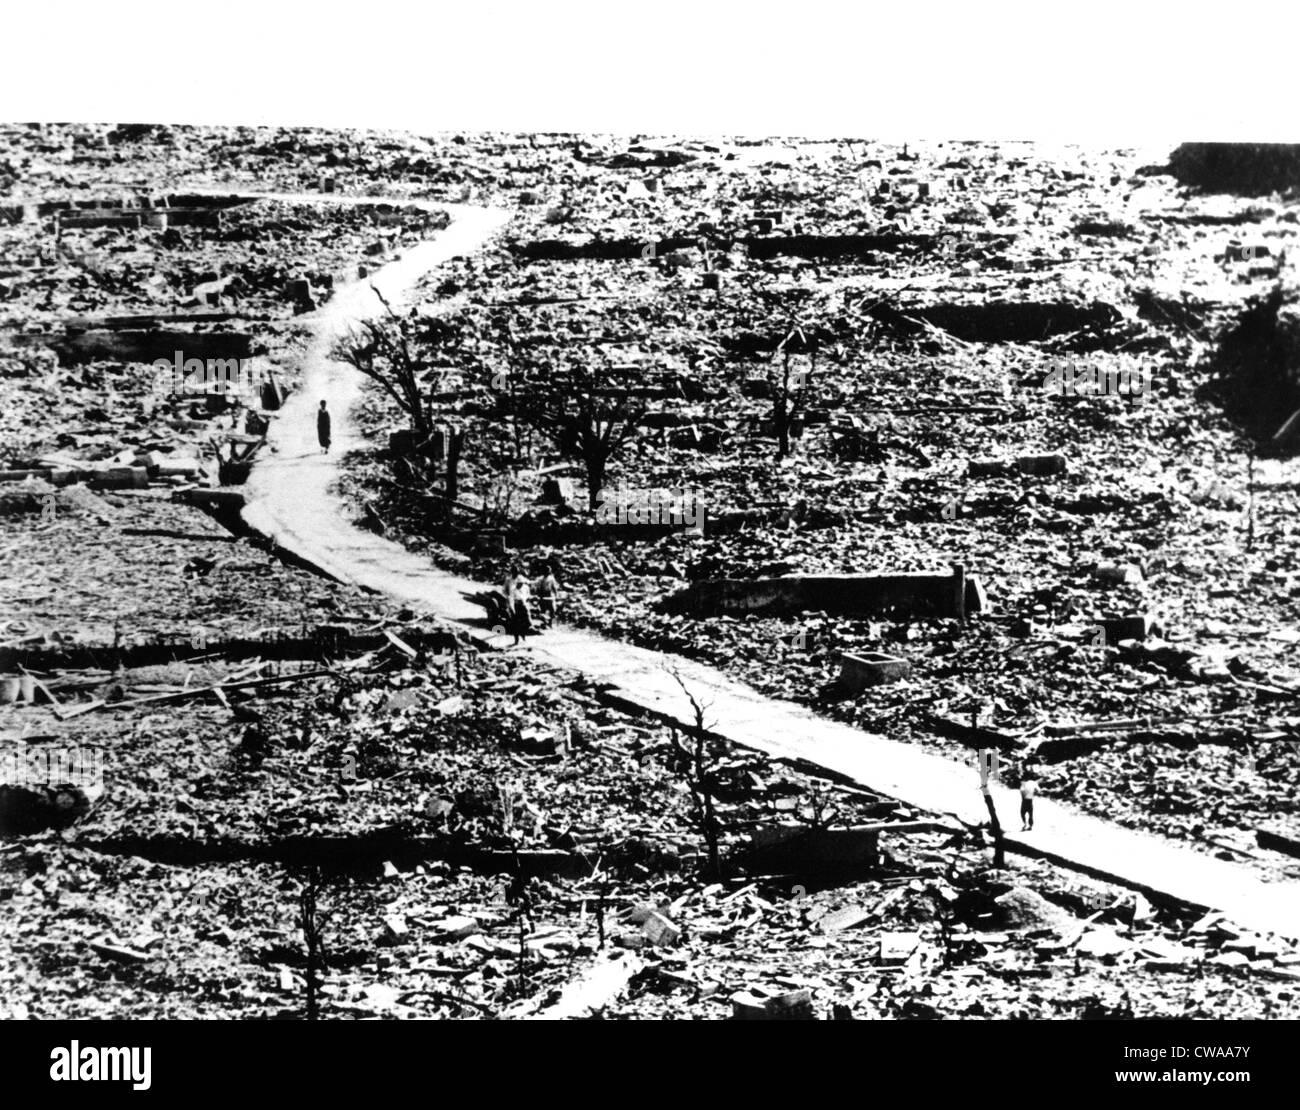 World War II, aftermath of Atomic Bomb hitting Nagasaki, Japan, ca. 1945. Courtesy: CSU Archives / Everett Collection - Stock Image